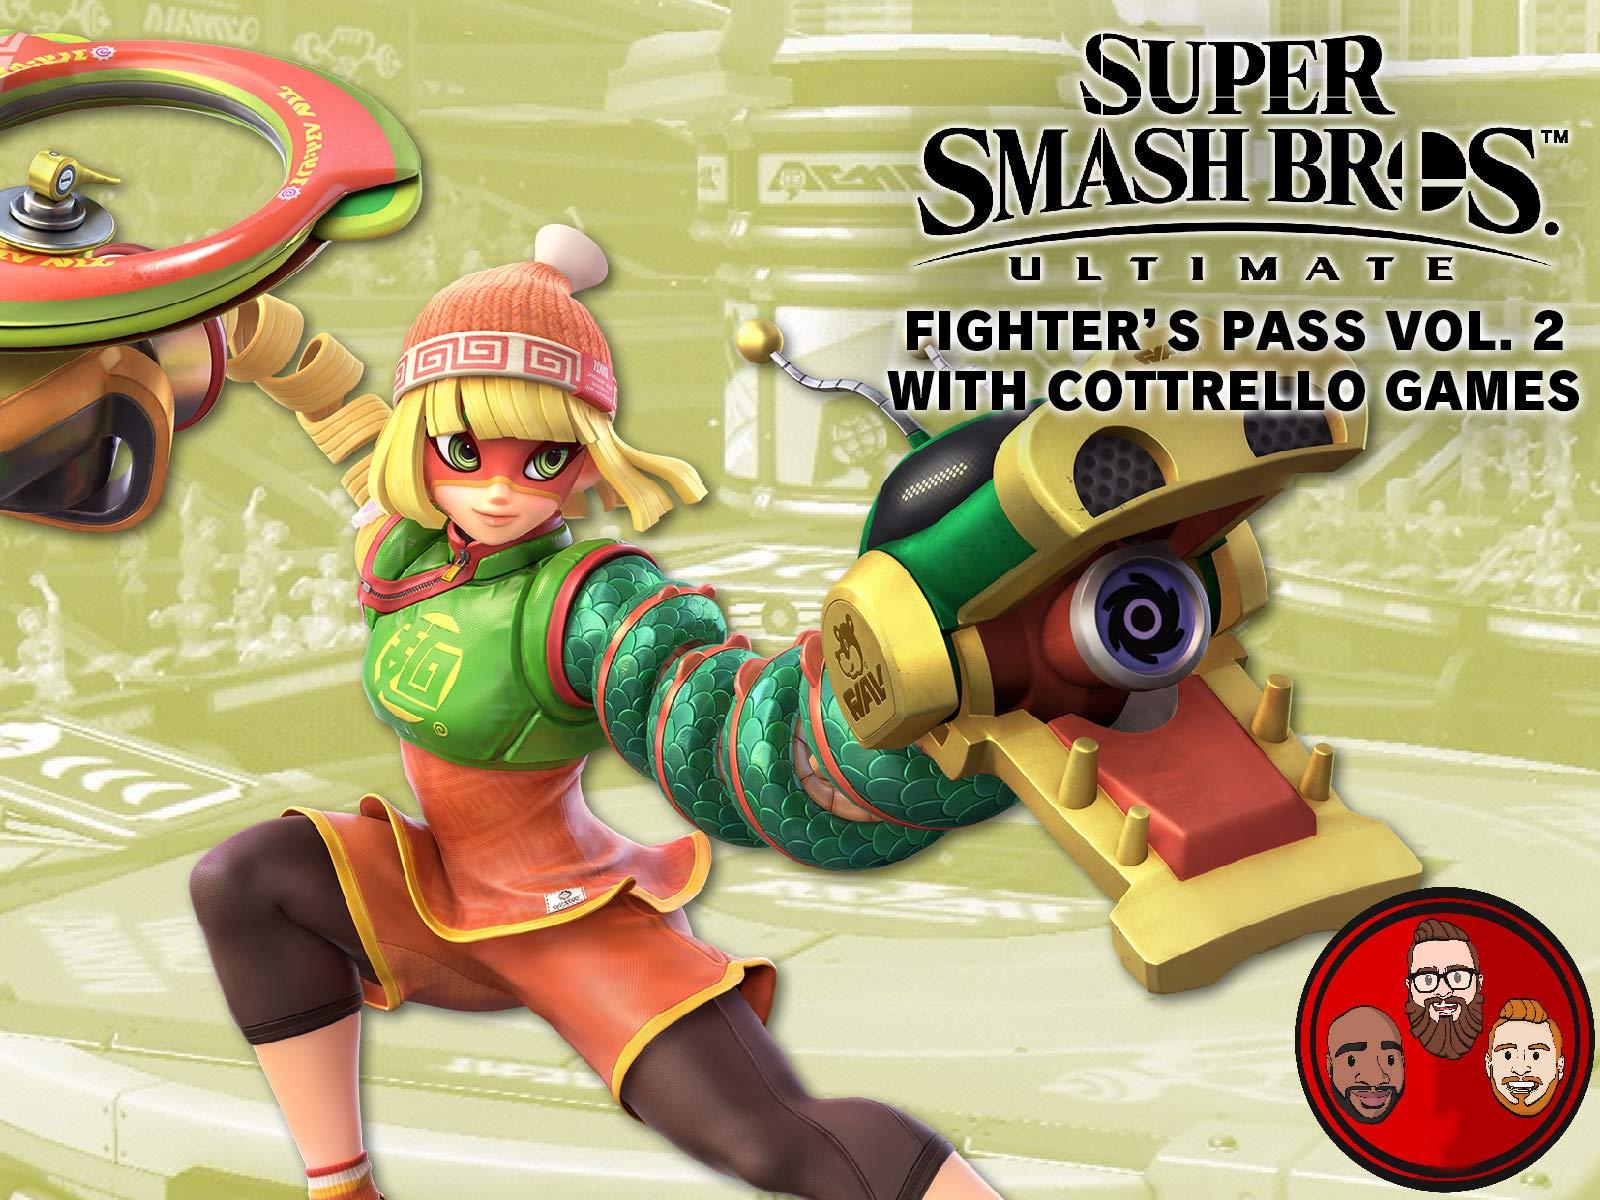 Super Smash Bros Ultimate Fighter's Pass Vol. 2 with Cottrello Games - Season 1